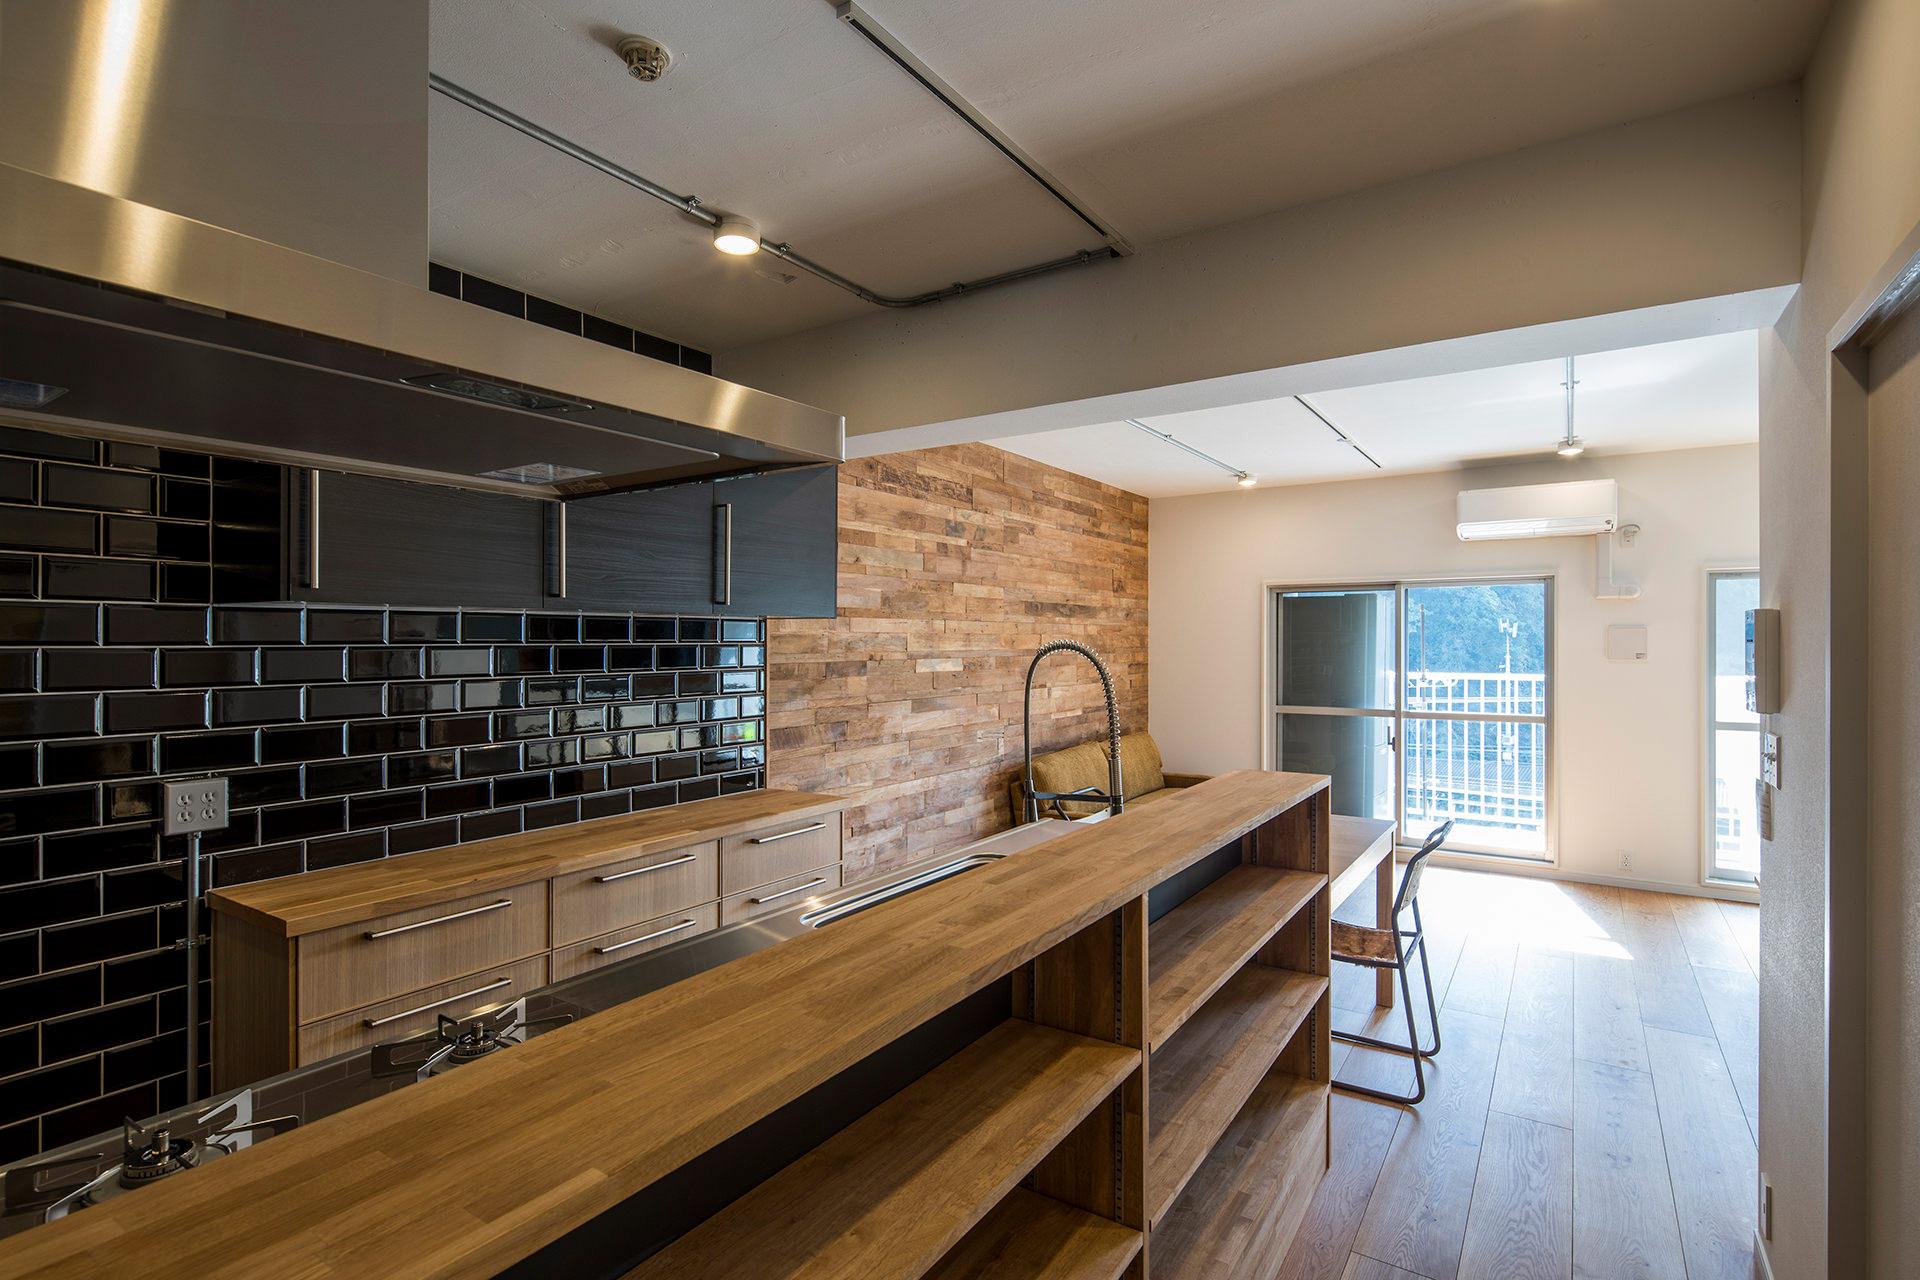 stri-ep house* flat 田浦 イメージ1 撮影:東涌写真事務所・東涌宏和